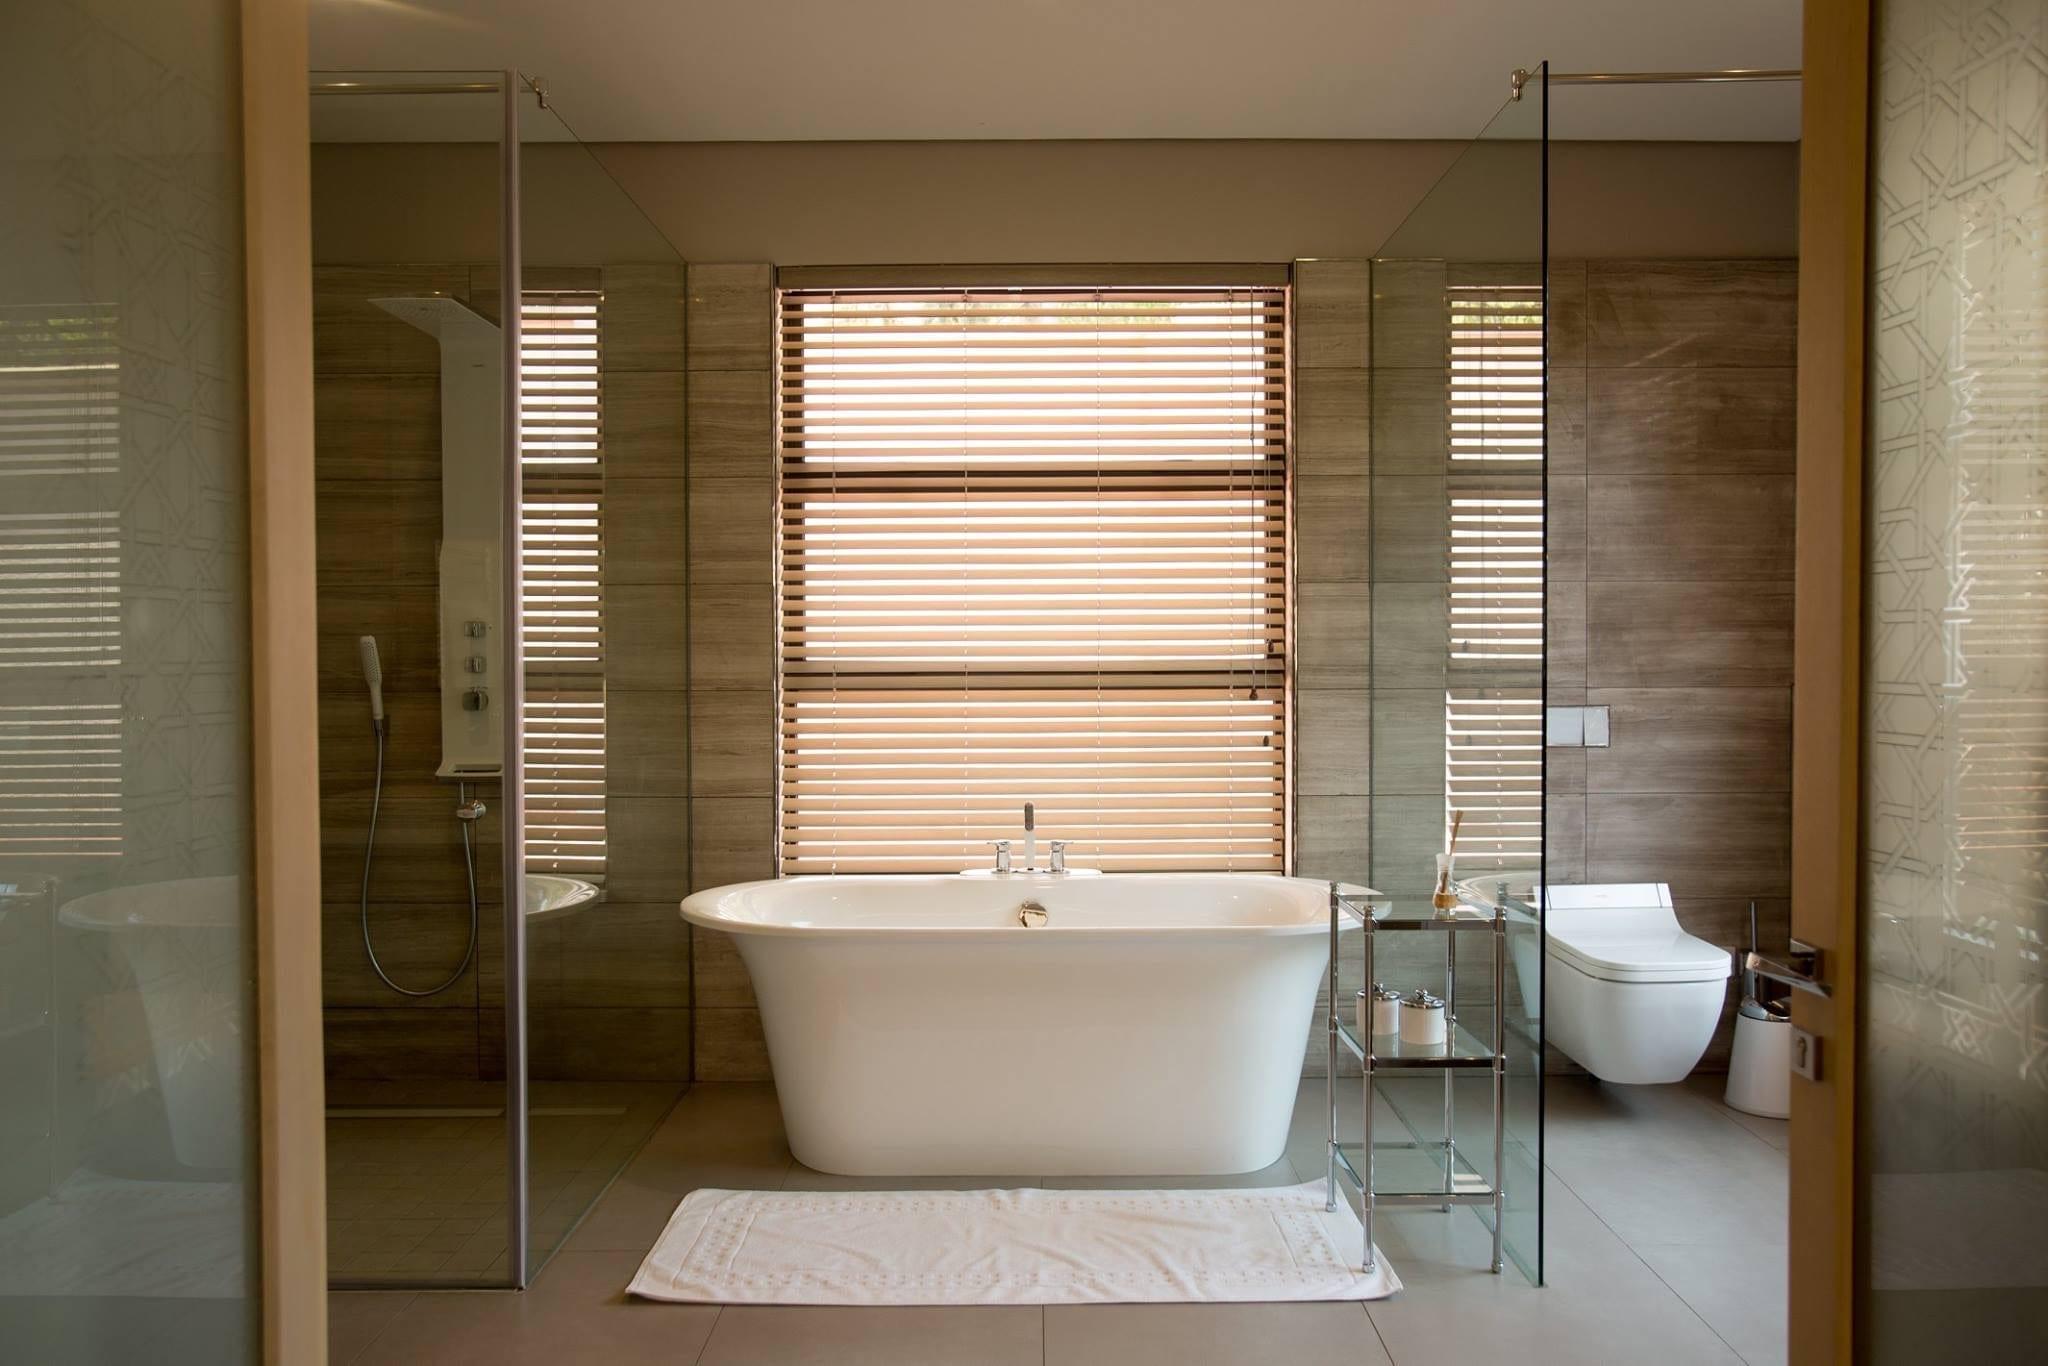 Bathrooms - Metal Window Servicing CCMetal Window Servicing CC